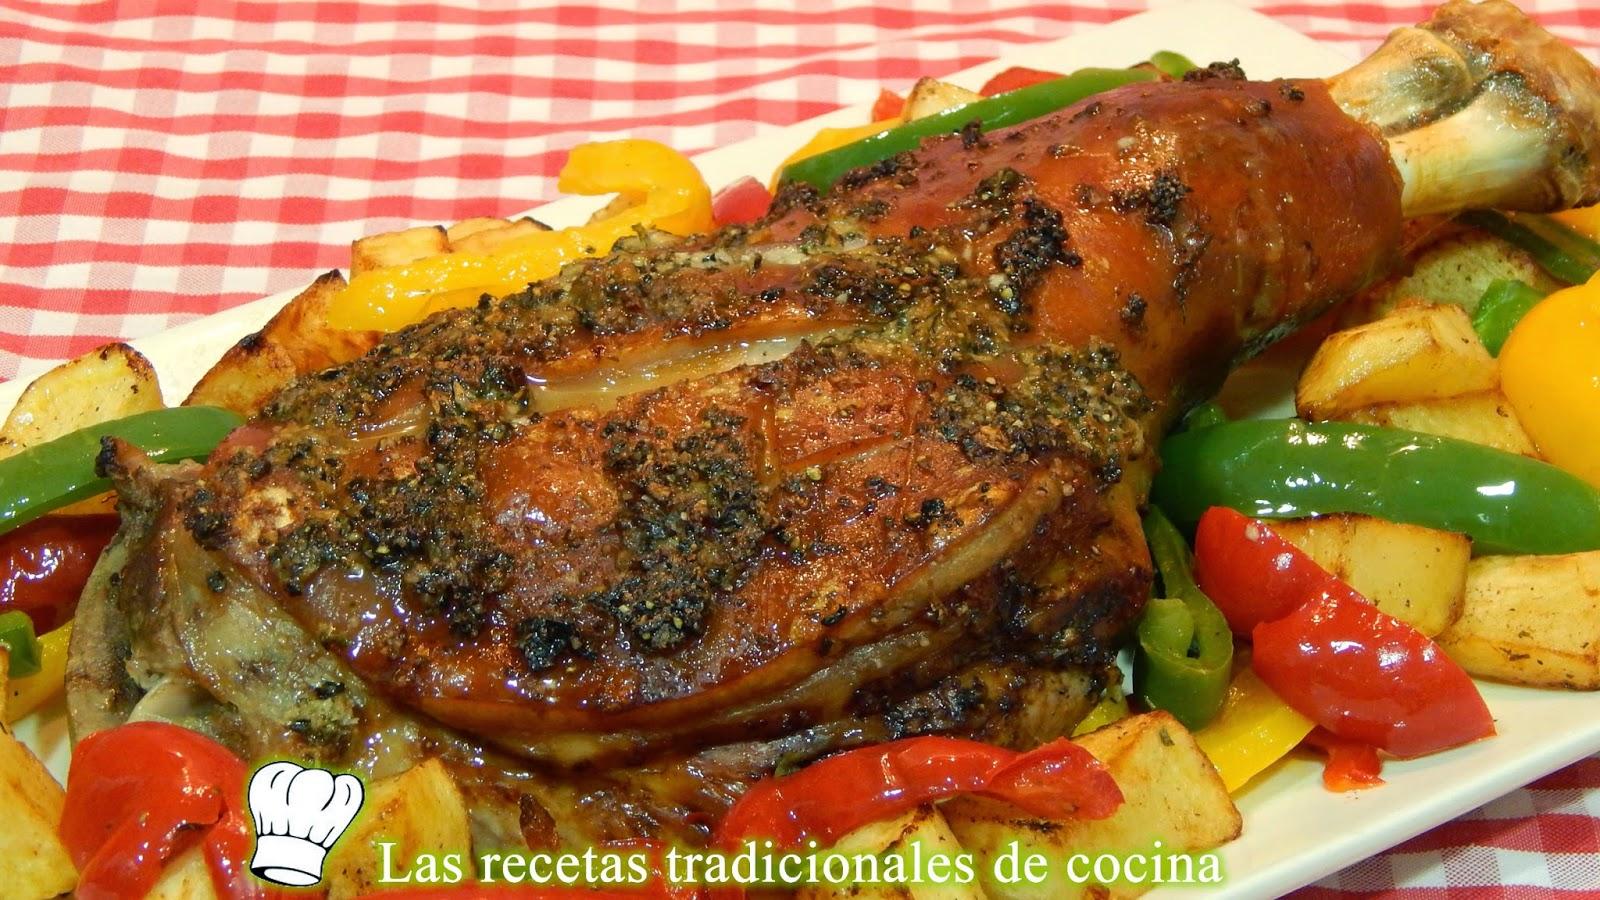 Como Cocinar Un Cochinillo | Receta De Paletilla De Cochinillo Al Horno Recetas De Cocina Con